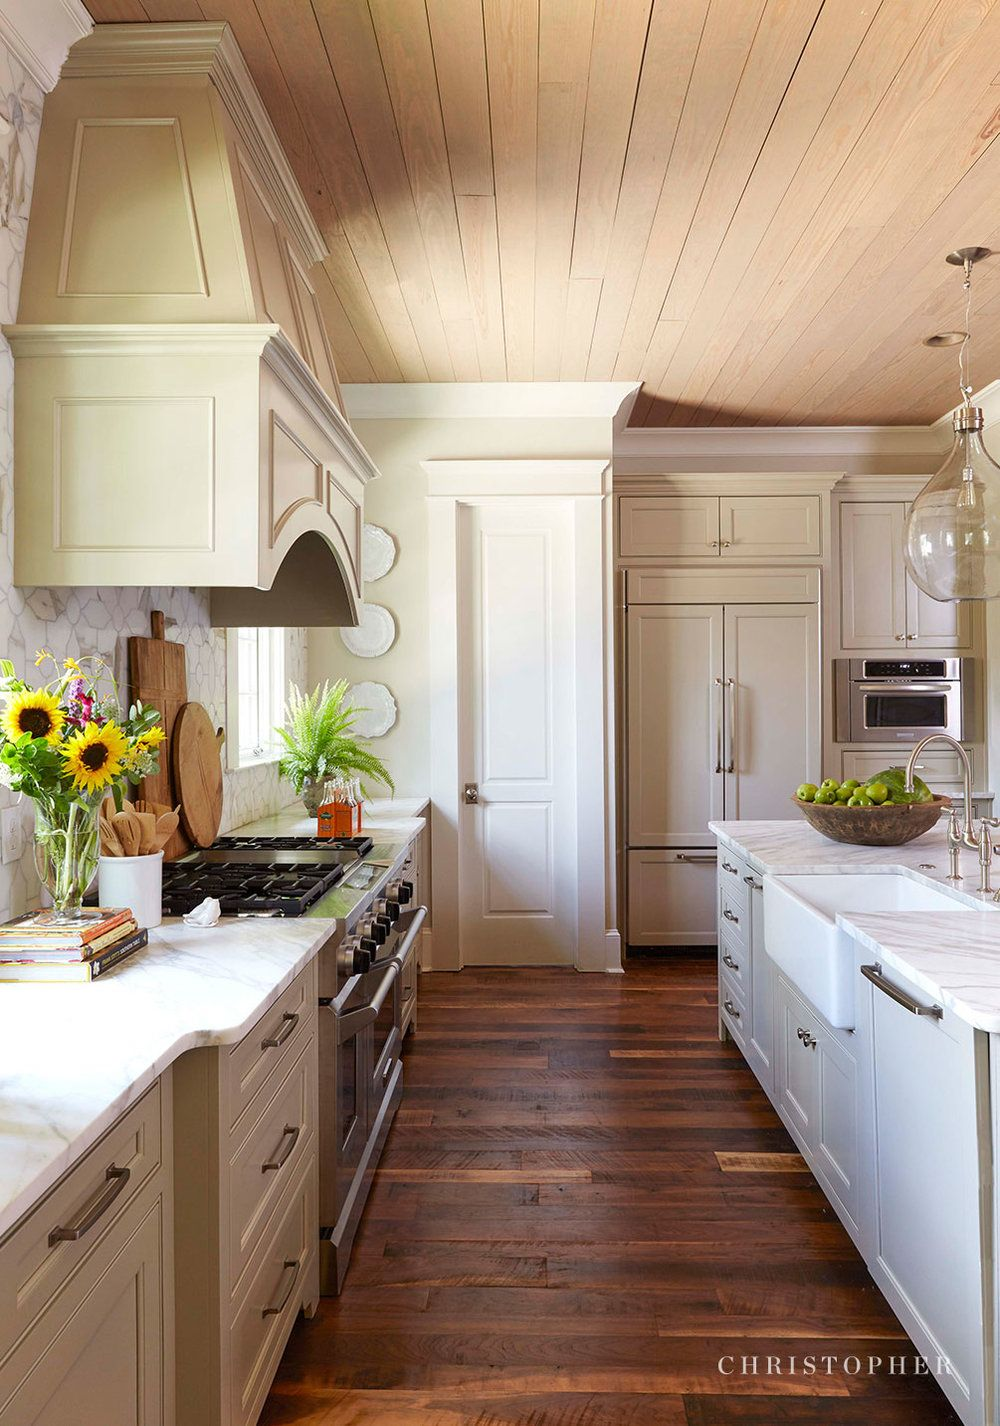 Kitchen Cabinet Interior Design: Luxury Commercial & Residential Architecture & Interior